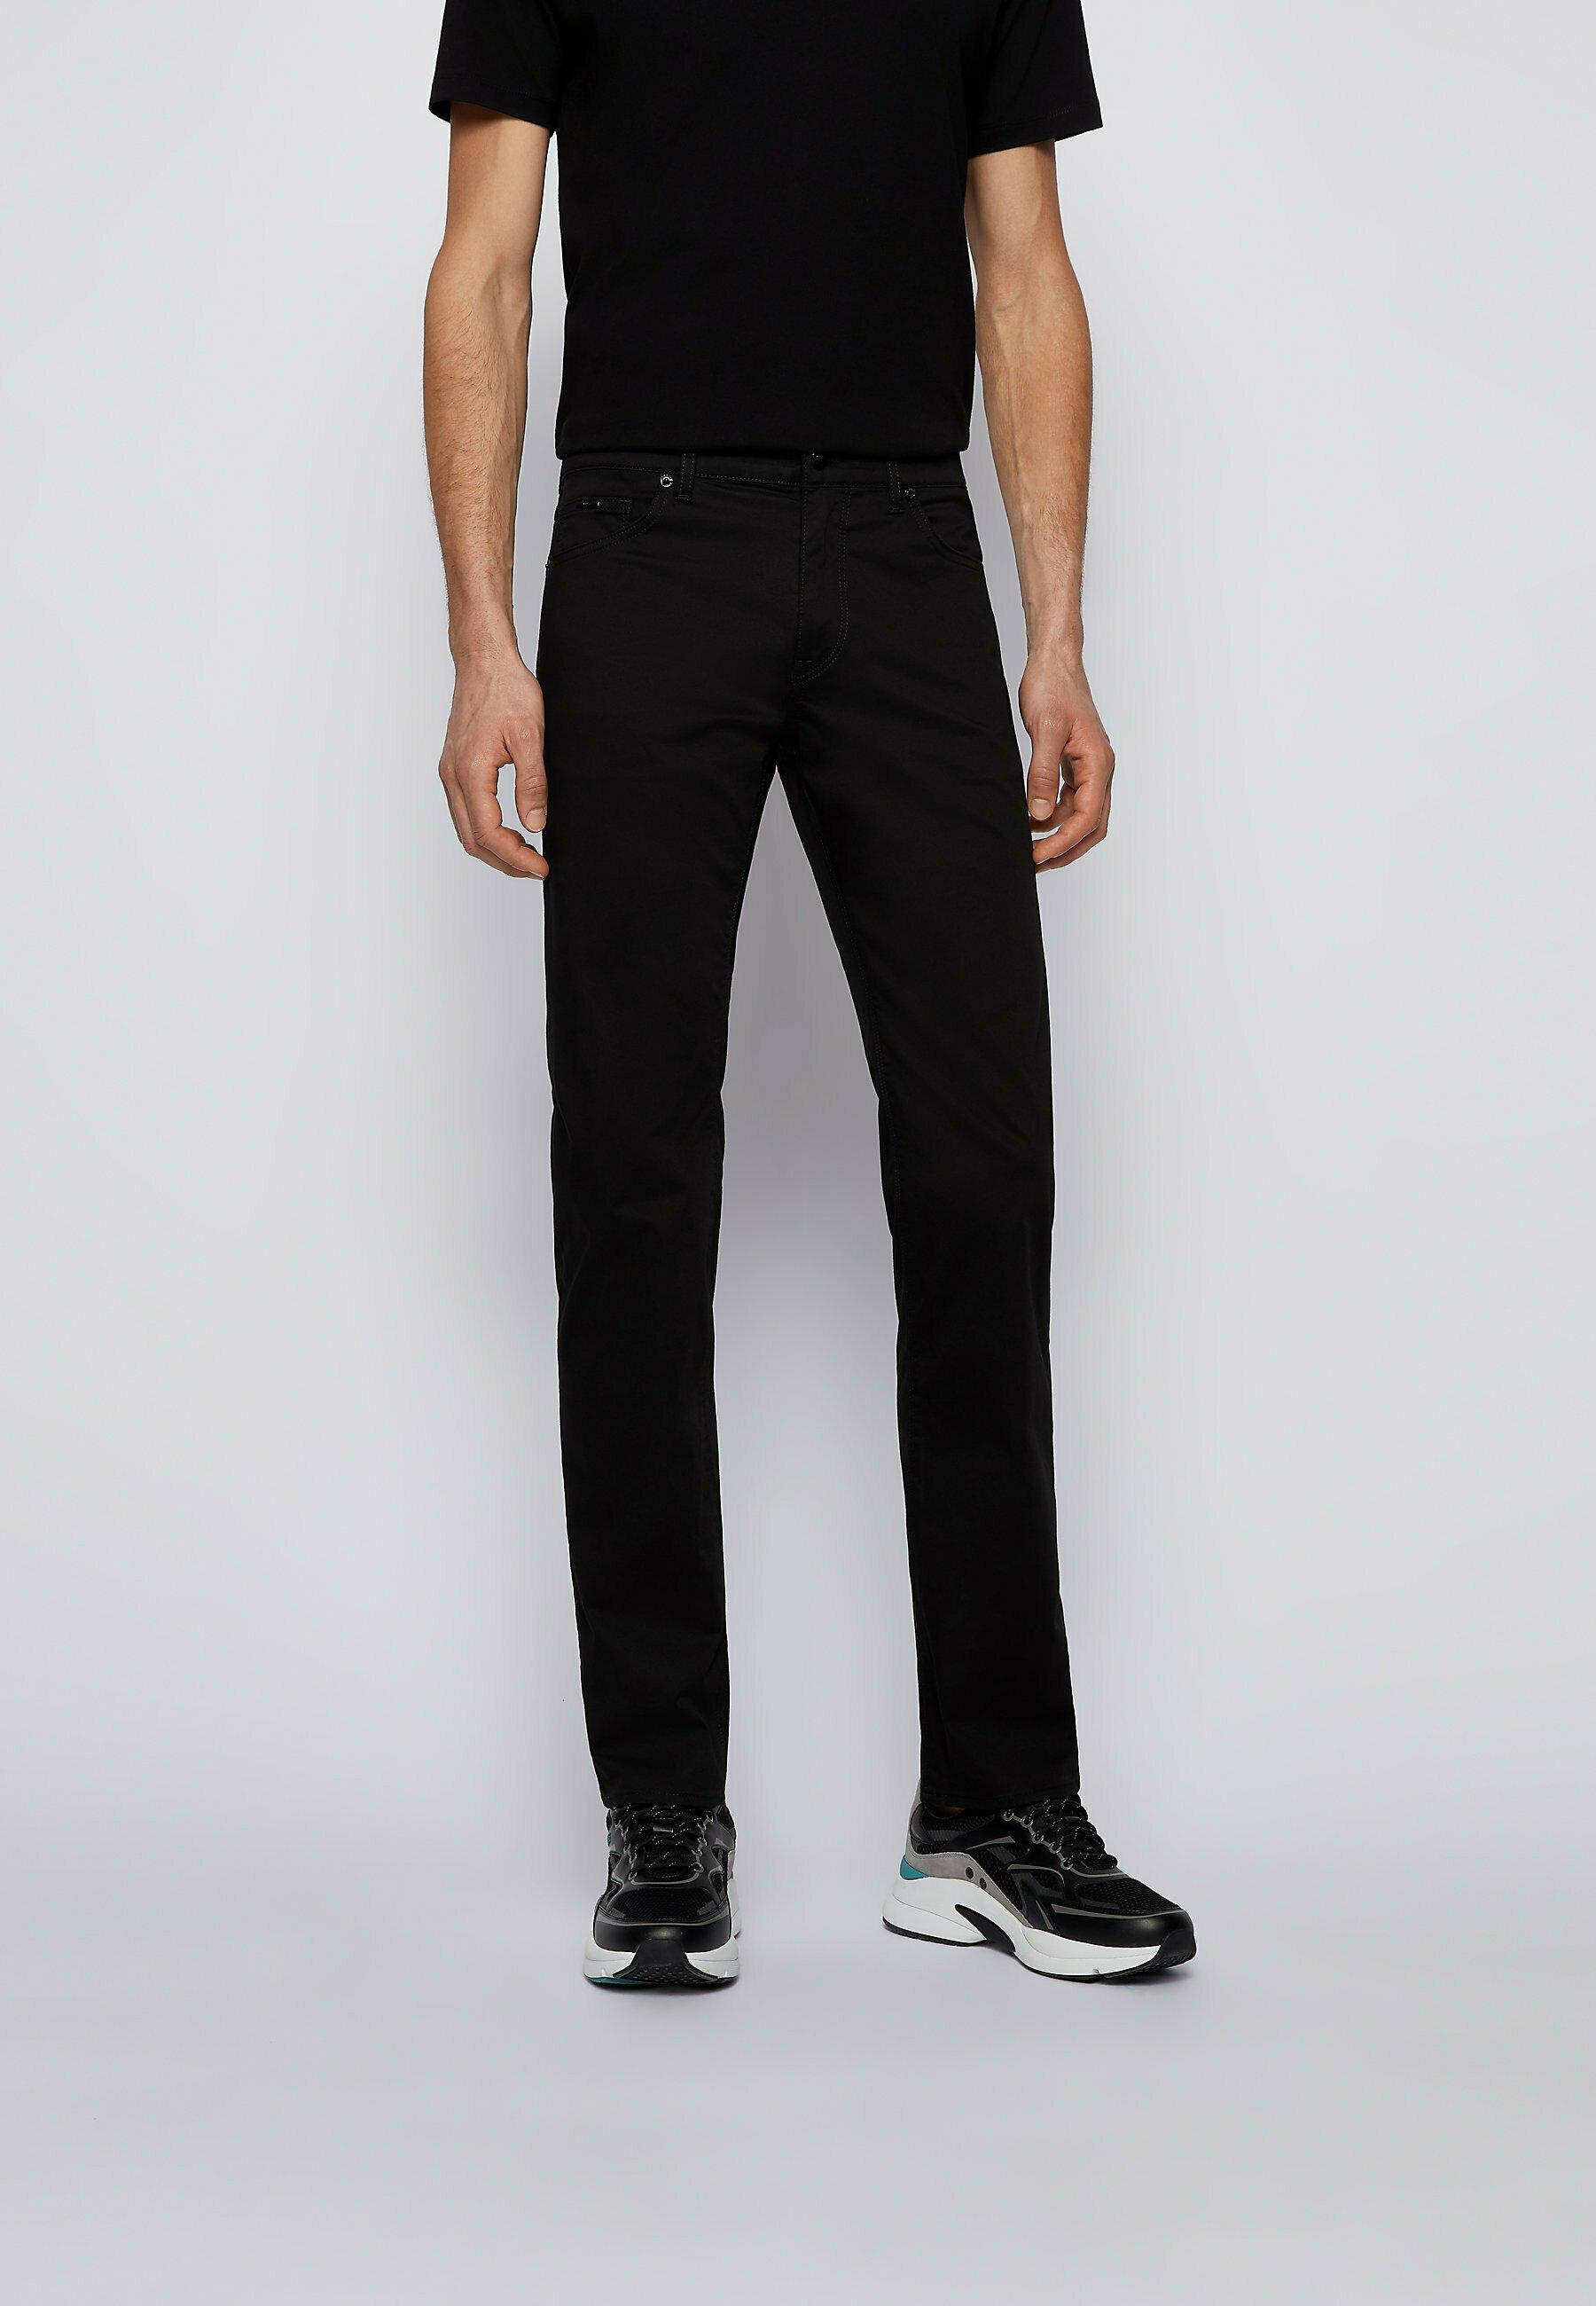 Uomo MAINE - Jeans slim fit